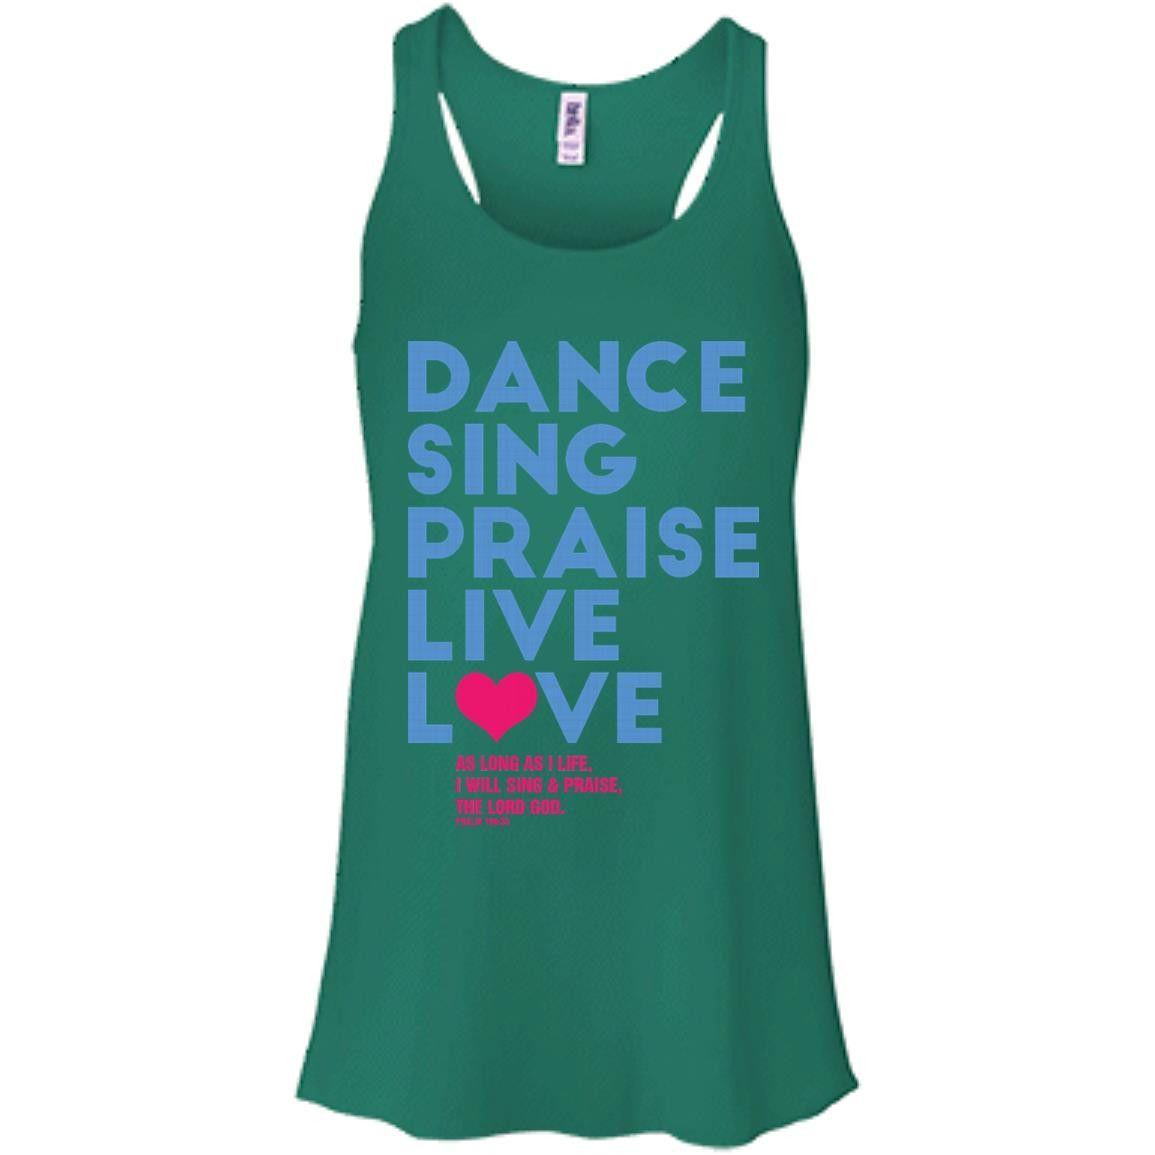 Dance Sing Praise Live Love t shirt-01 Bella + Canvas Flowy Racerback Tank